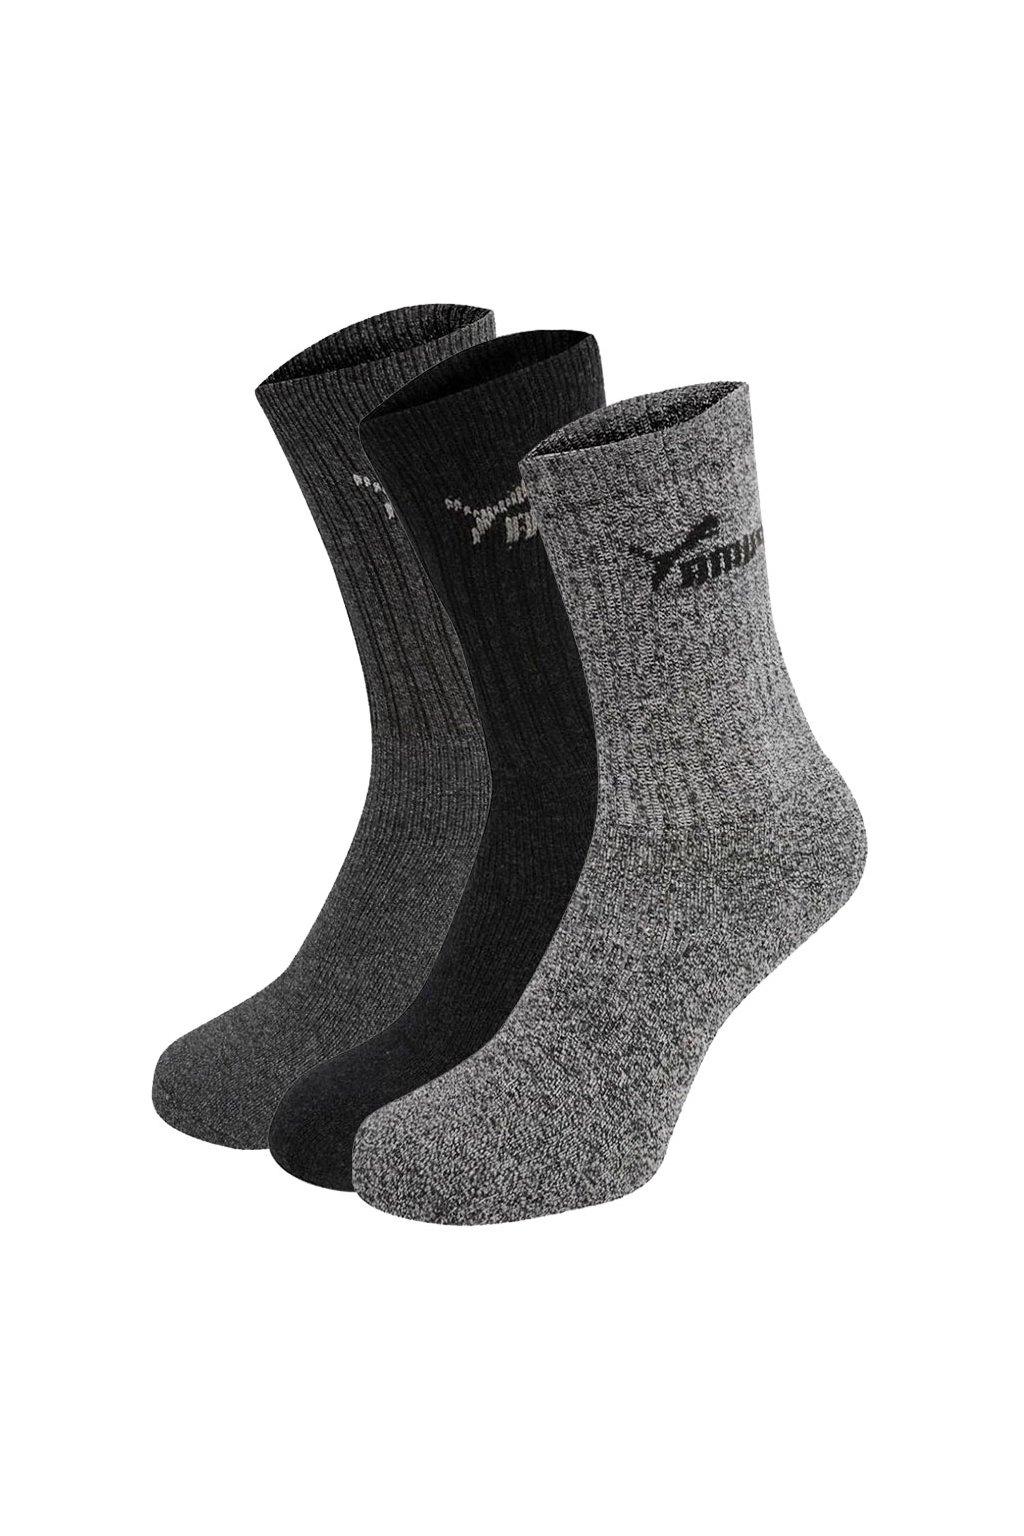 Ponožky Puma vysoké 3 páry 7308 207